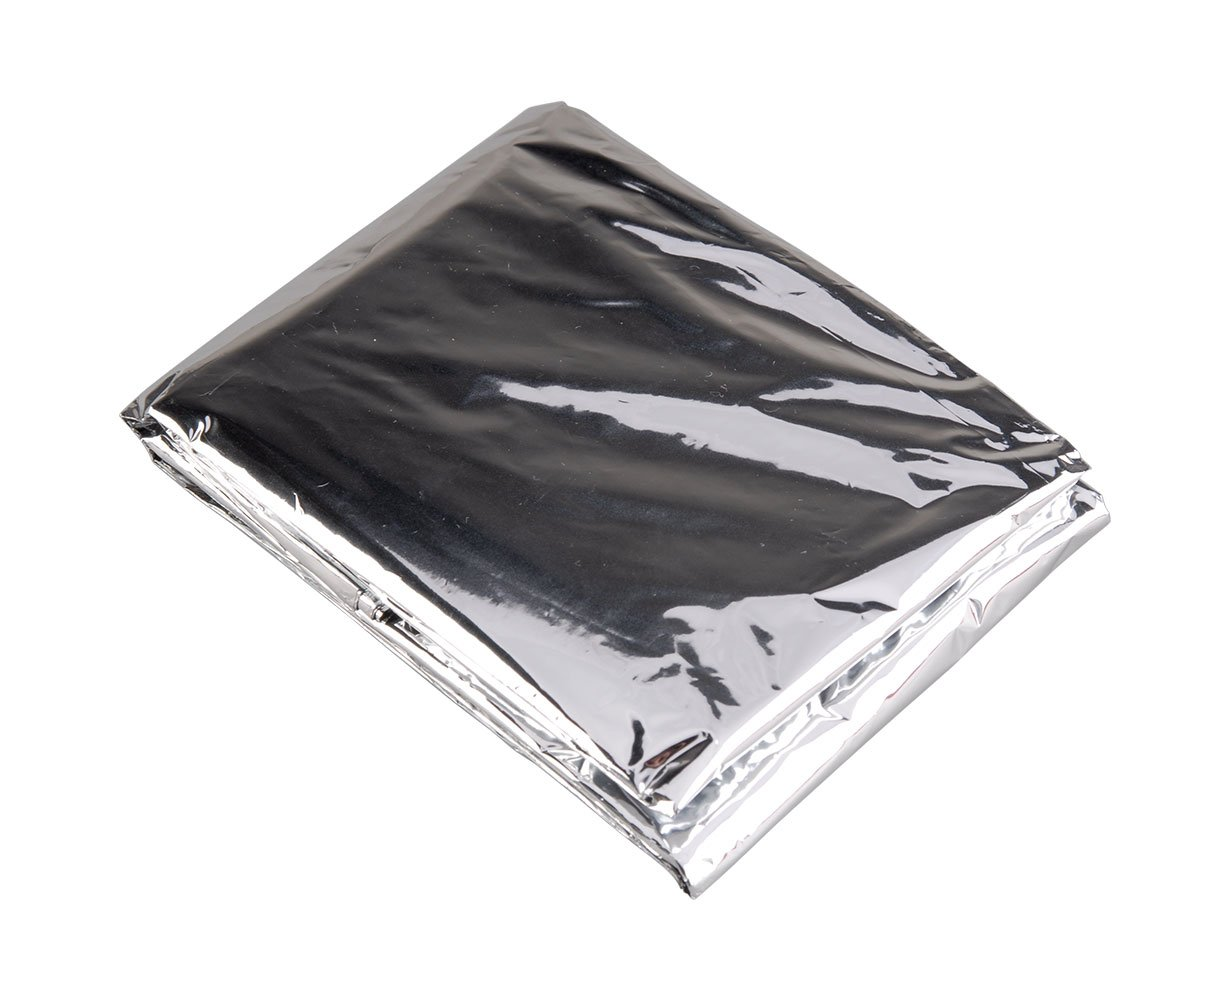 Amazon.com  Emergency Thermal Outdoor Survival C&ing Kit - Blanket Tent Sleeping Bag  Emergency C&ing Blankets  Sports u0026 Outdoors  sc 1 st  Amazon.com & Amazon.com : Emergency Thermal Outdoor Survival Camping Kit ...